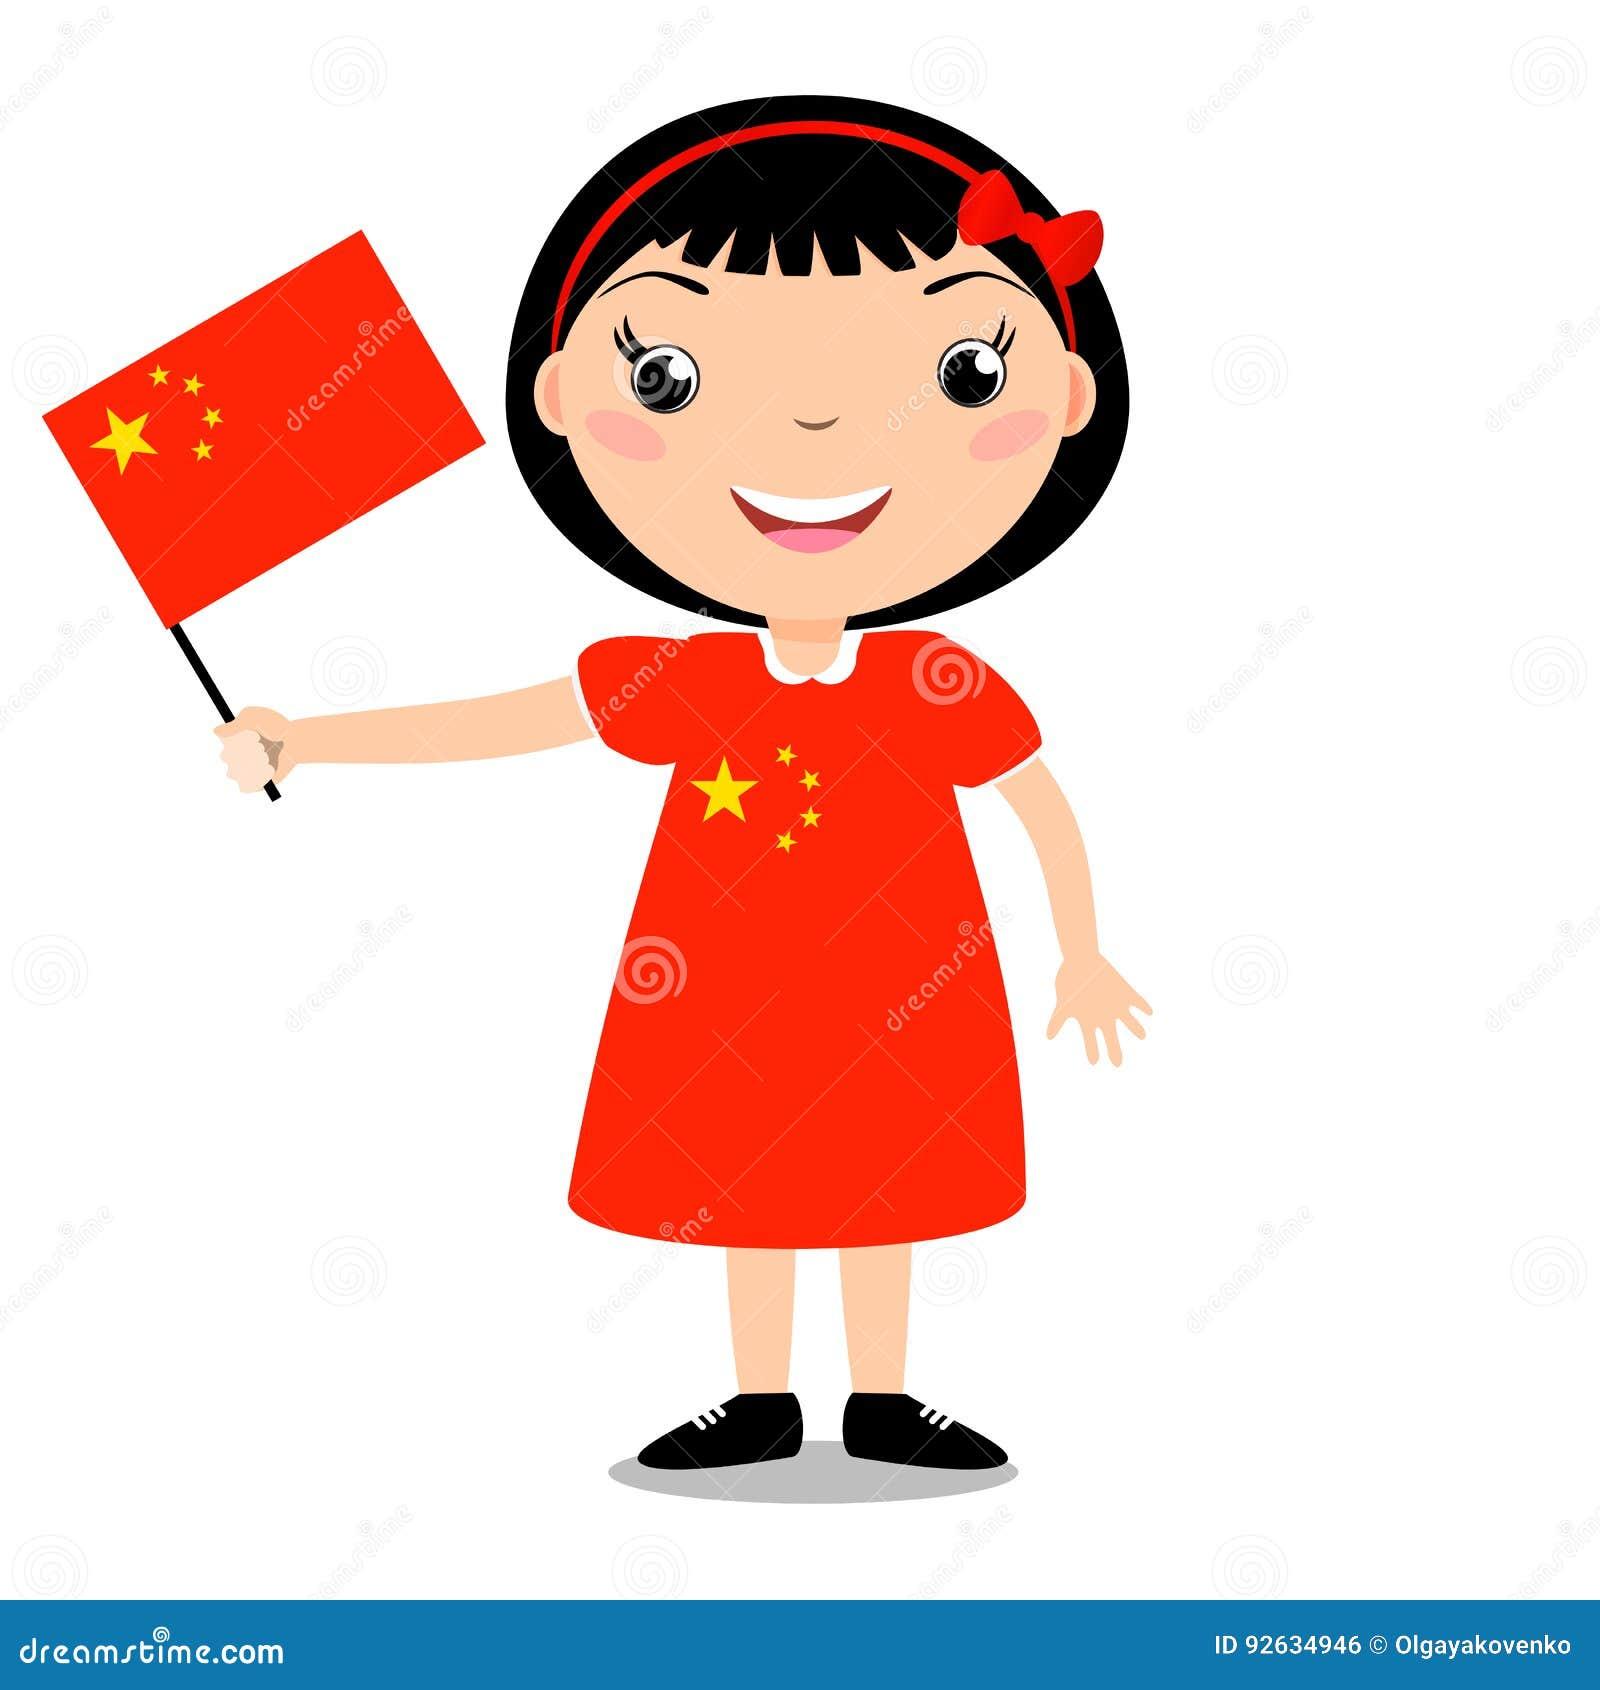 Child China Stock Illustrations 4 572 Child China Stock Illustrations Vectors Clipart Dreamstime